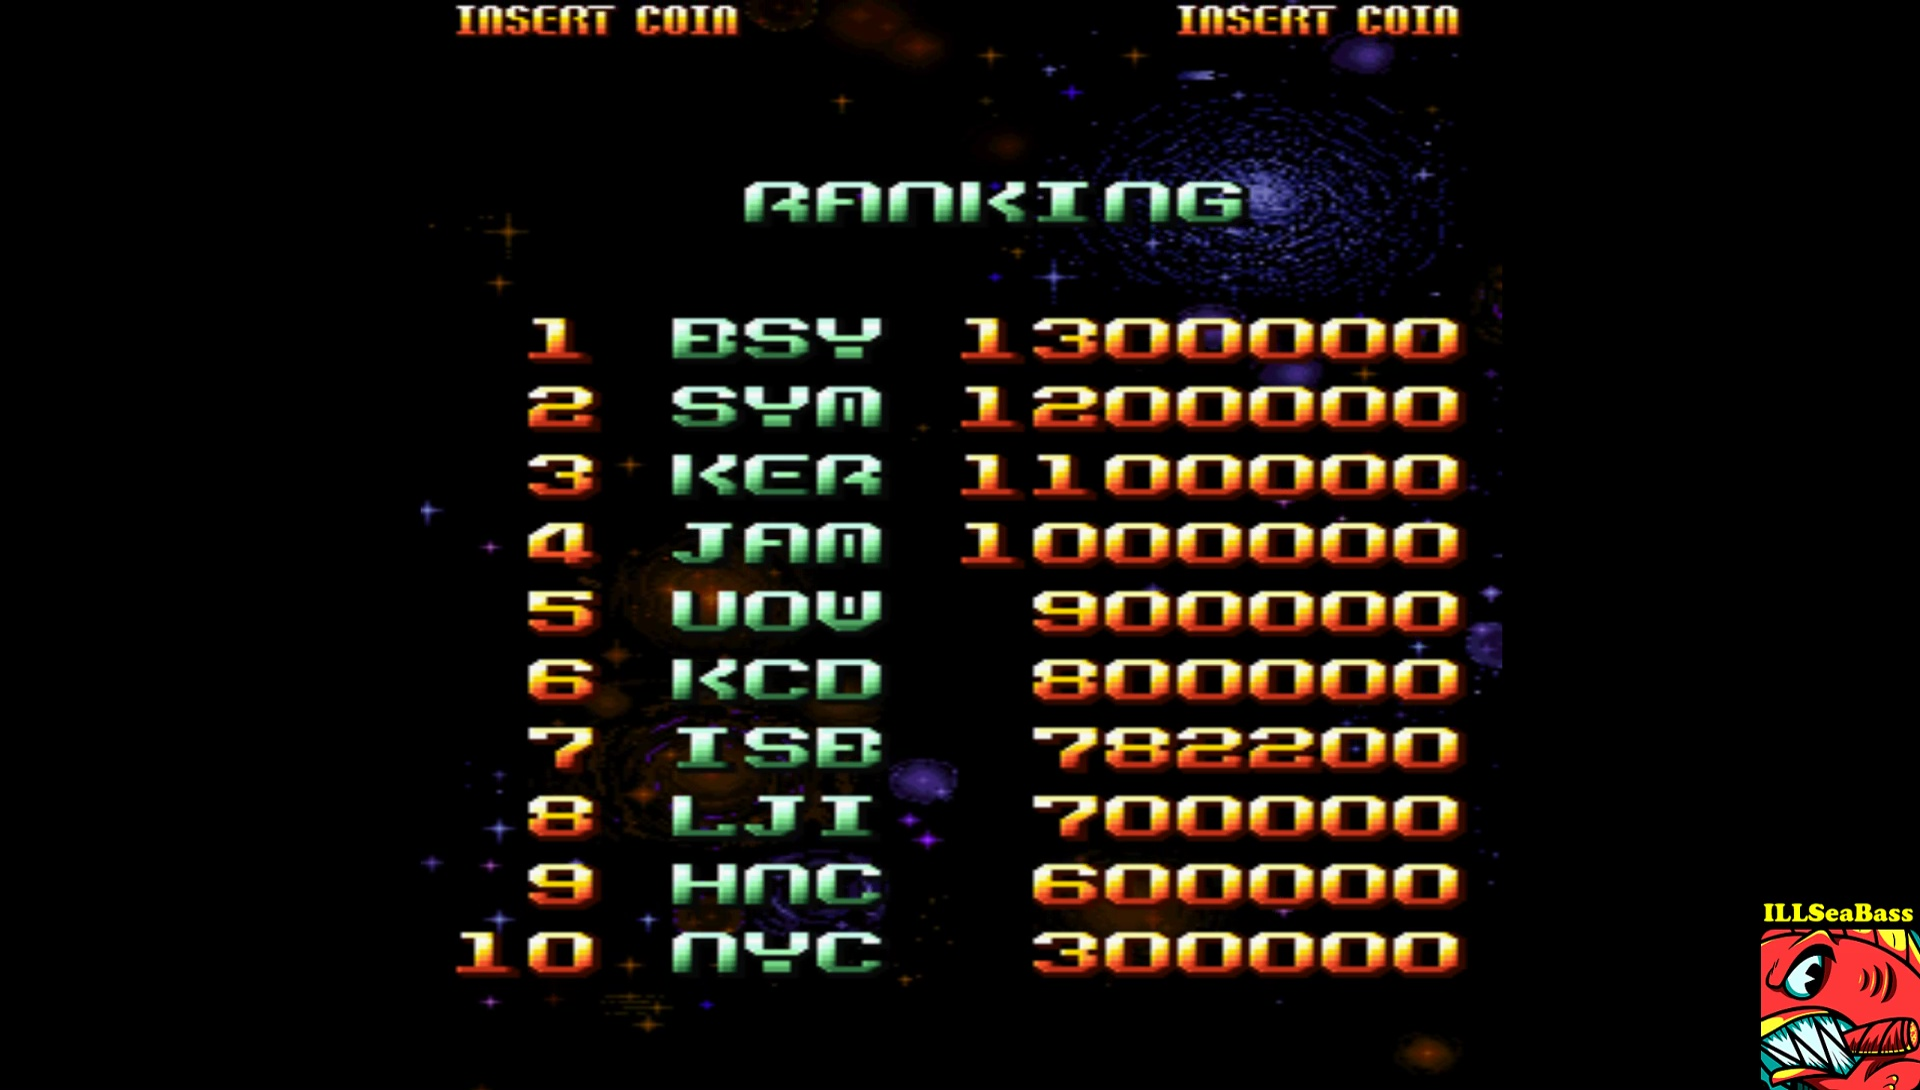 ILLSeaBass: Super-X [superx] (Arcade Emulated / M.A.M.E.) 782,200 points on 2017-02-02 01:04:09